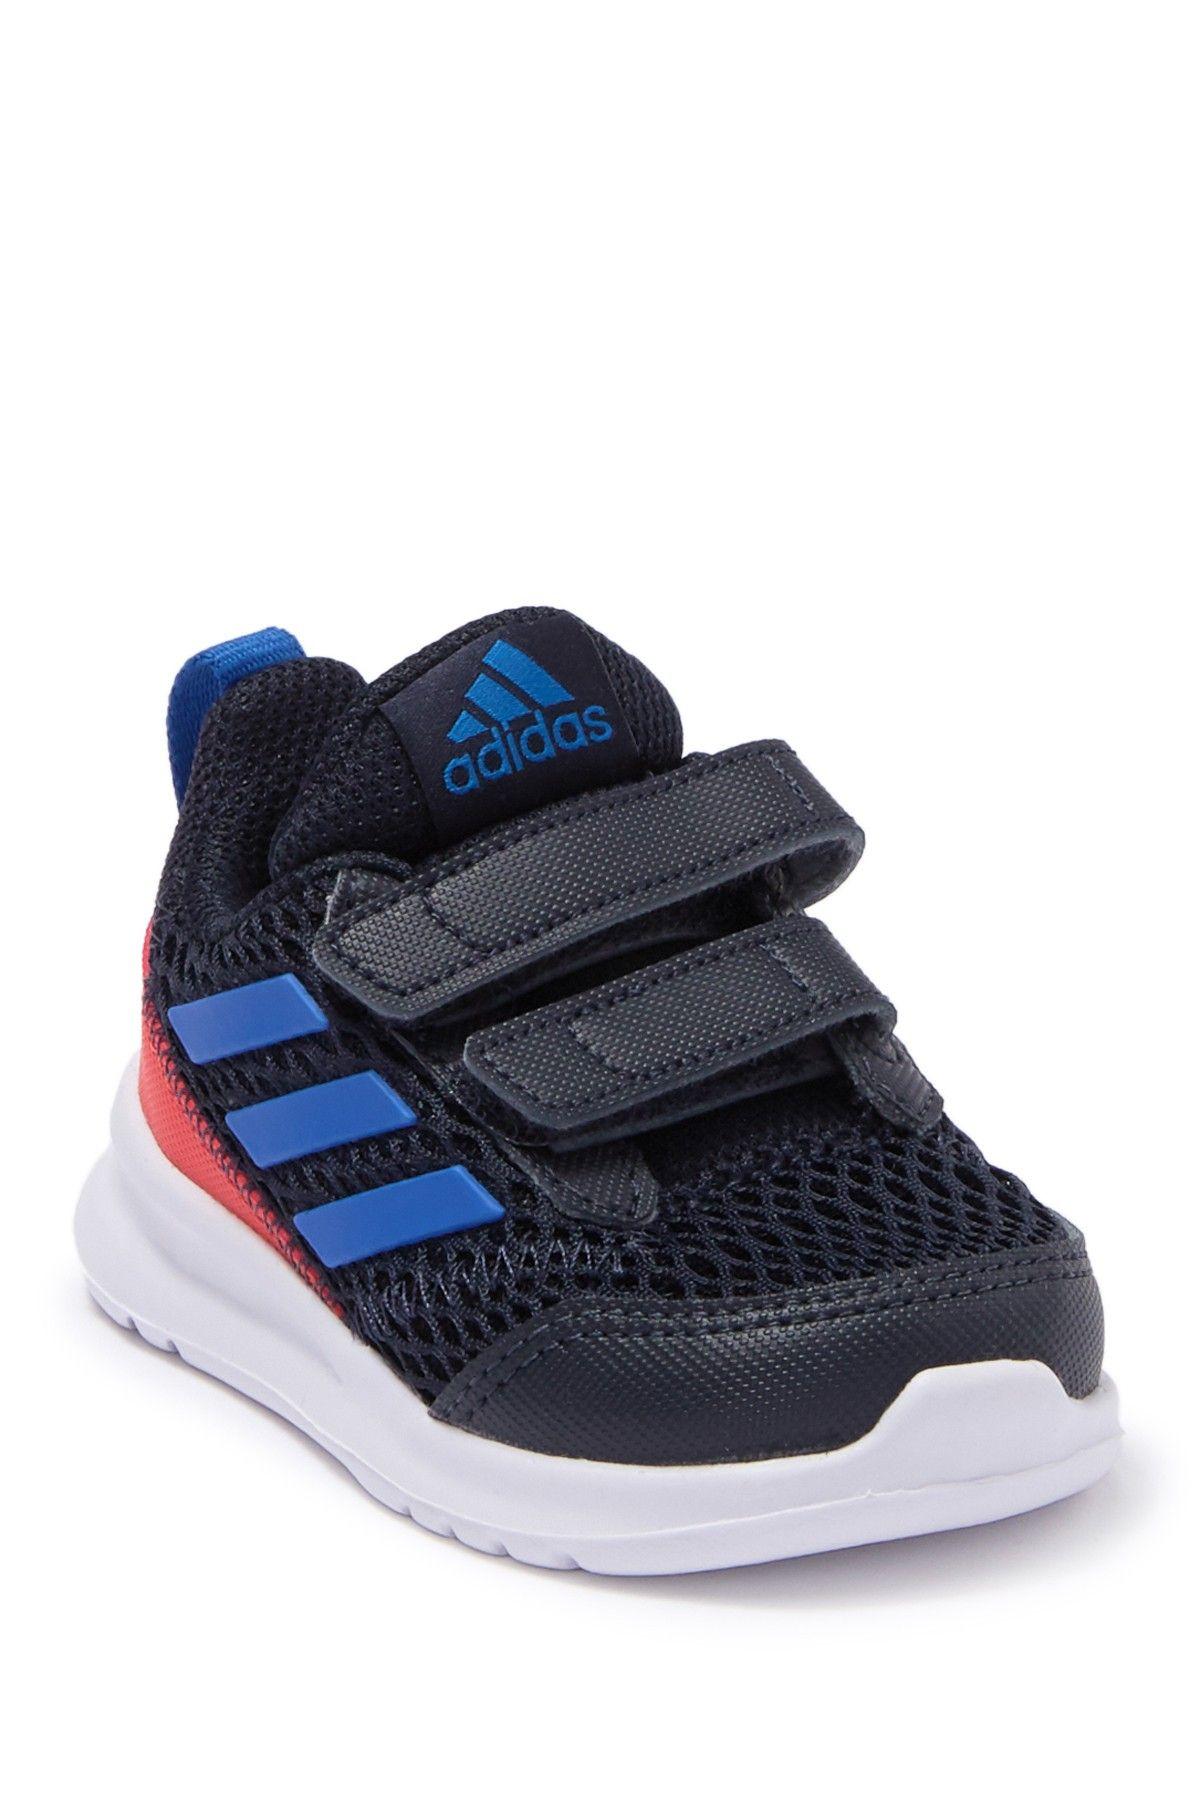 adidas Altarun Sneaker (Baby \u0026 Toddler